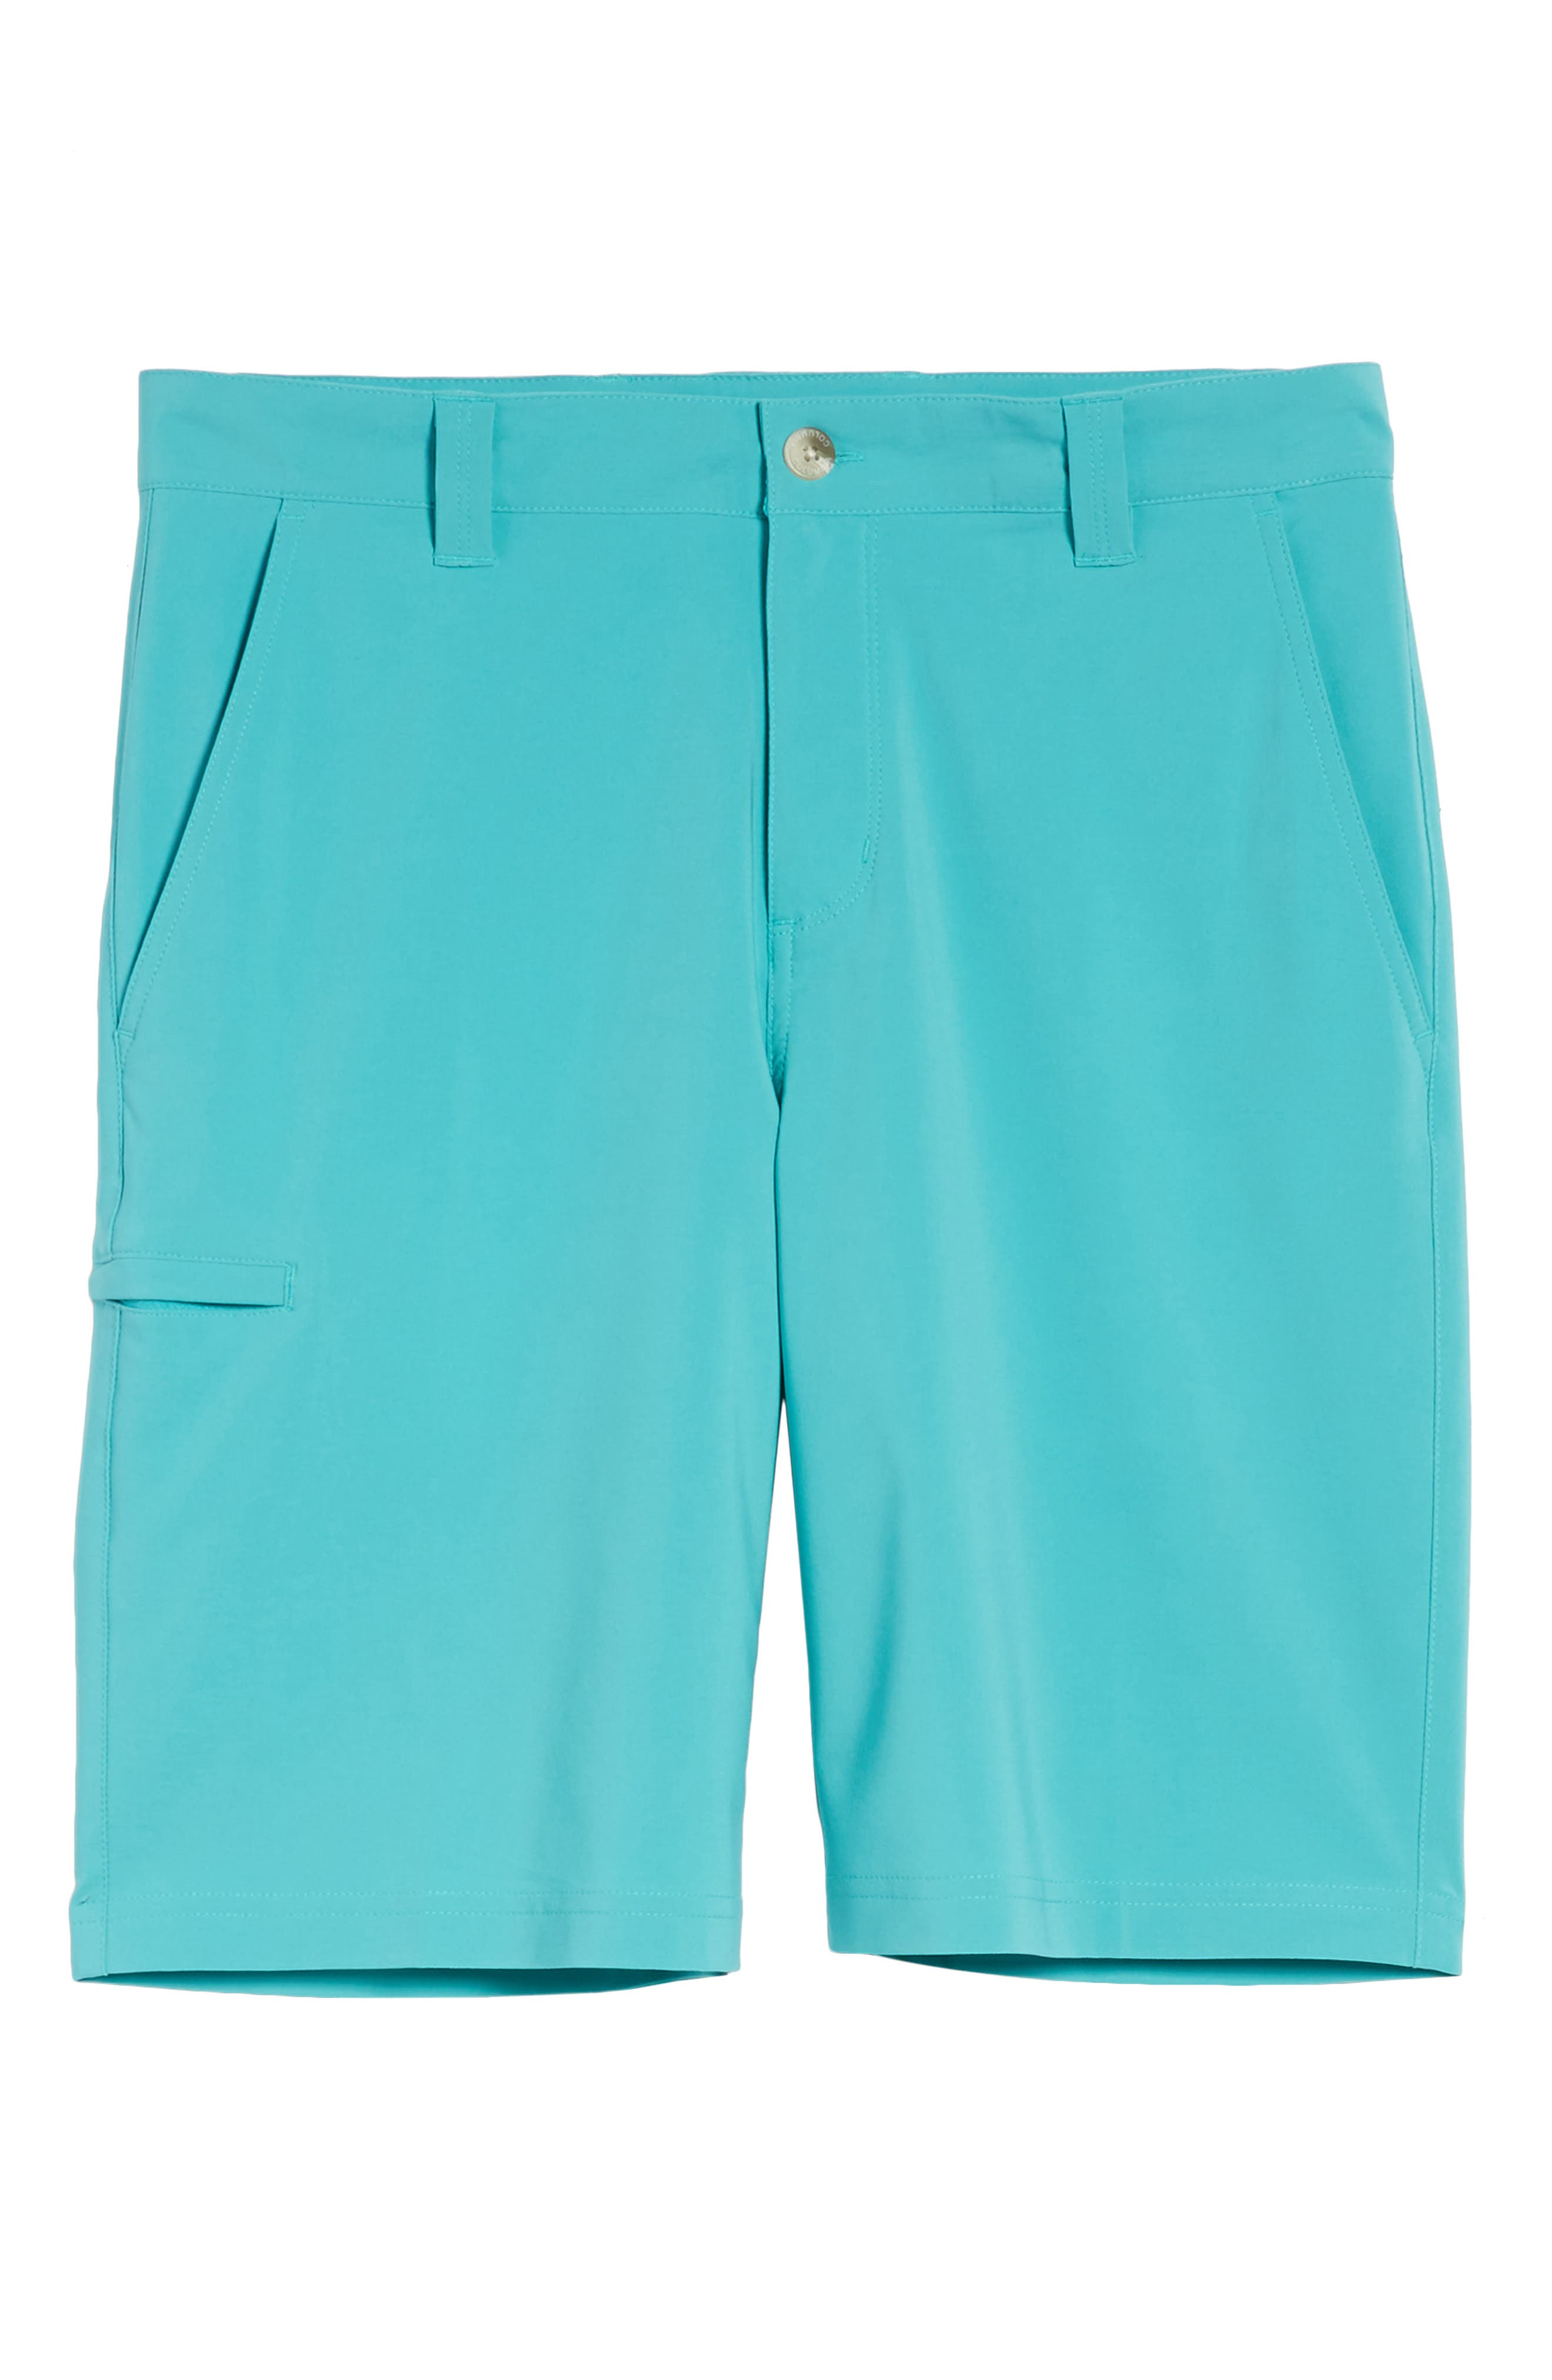 PFG Grander Marlin II Shorts,                             Alternate thumbnail 6, color,                             Miami